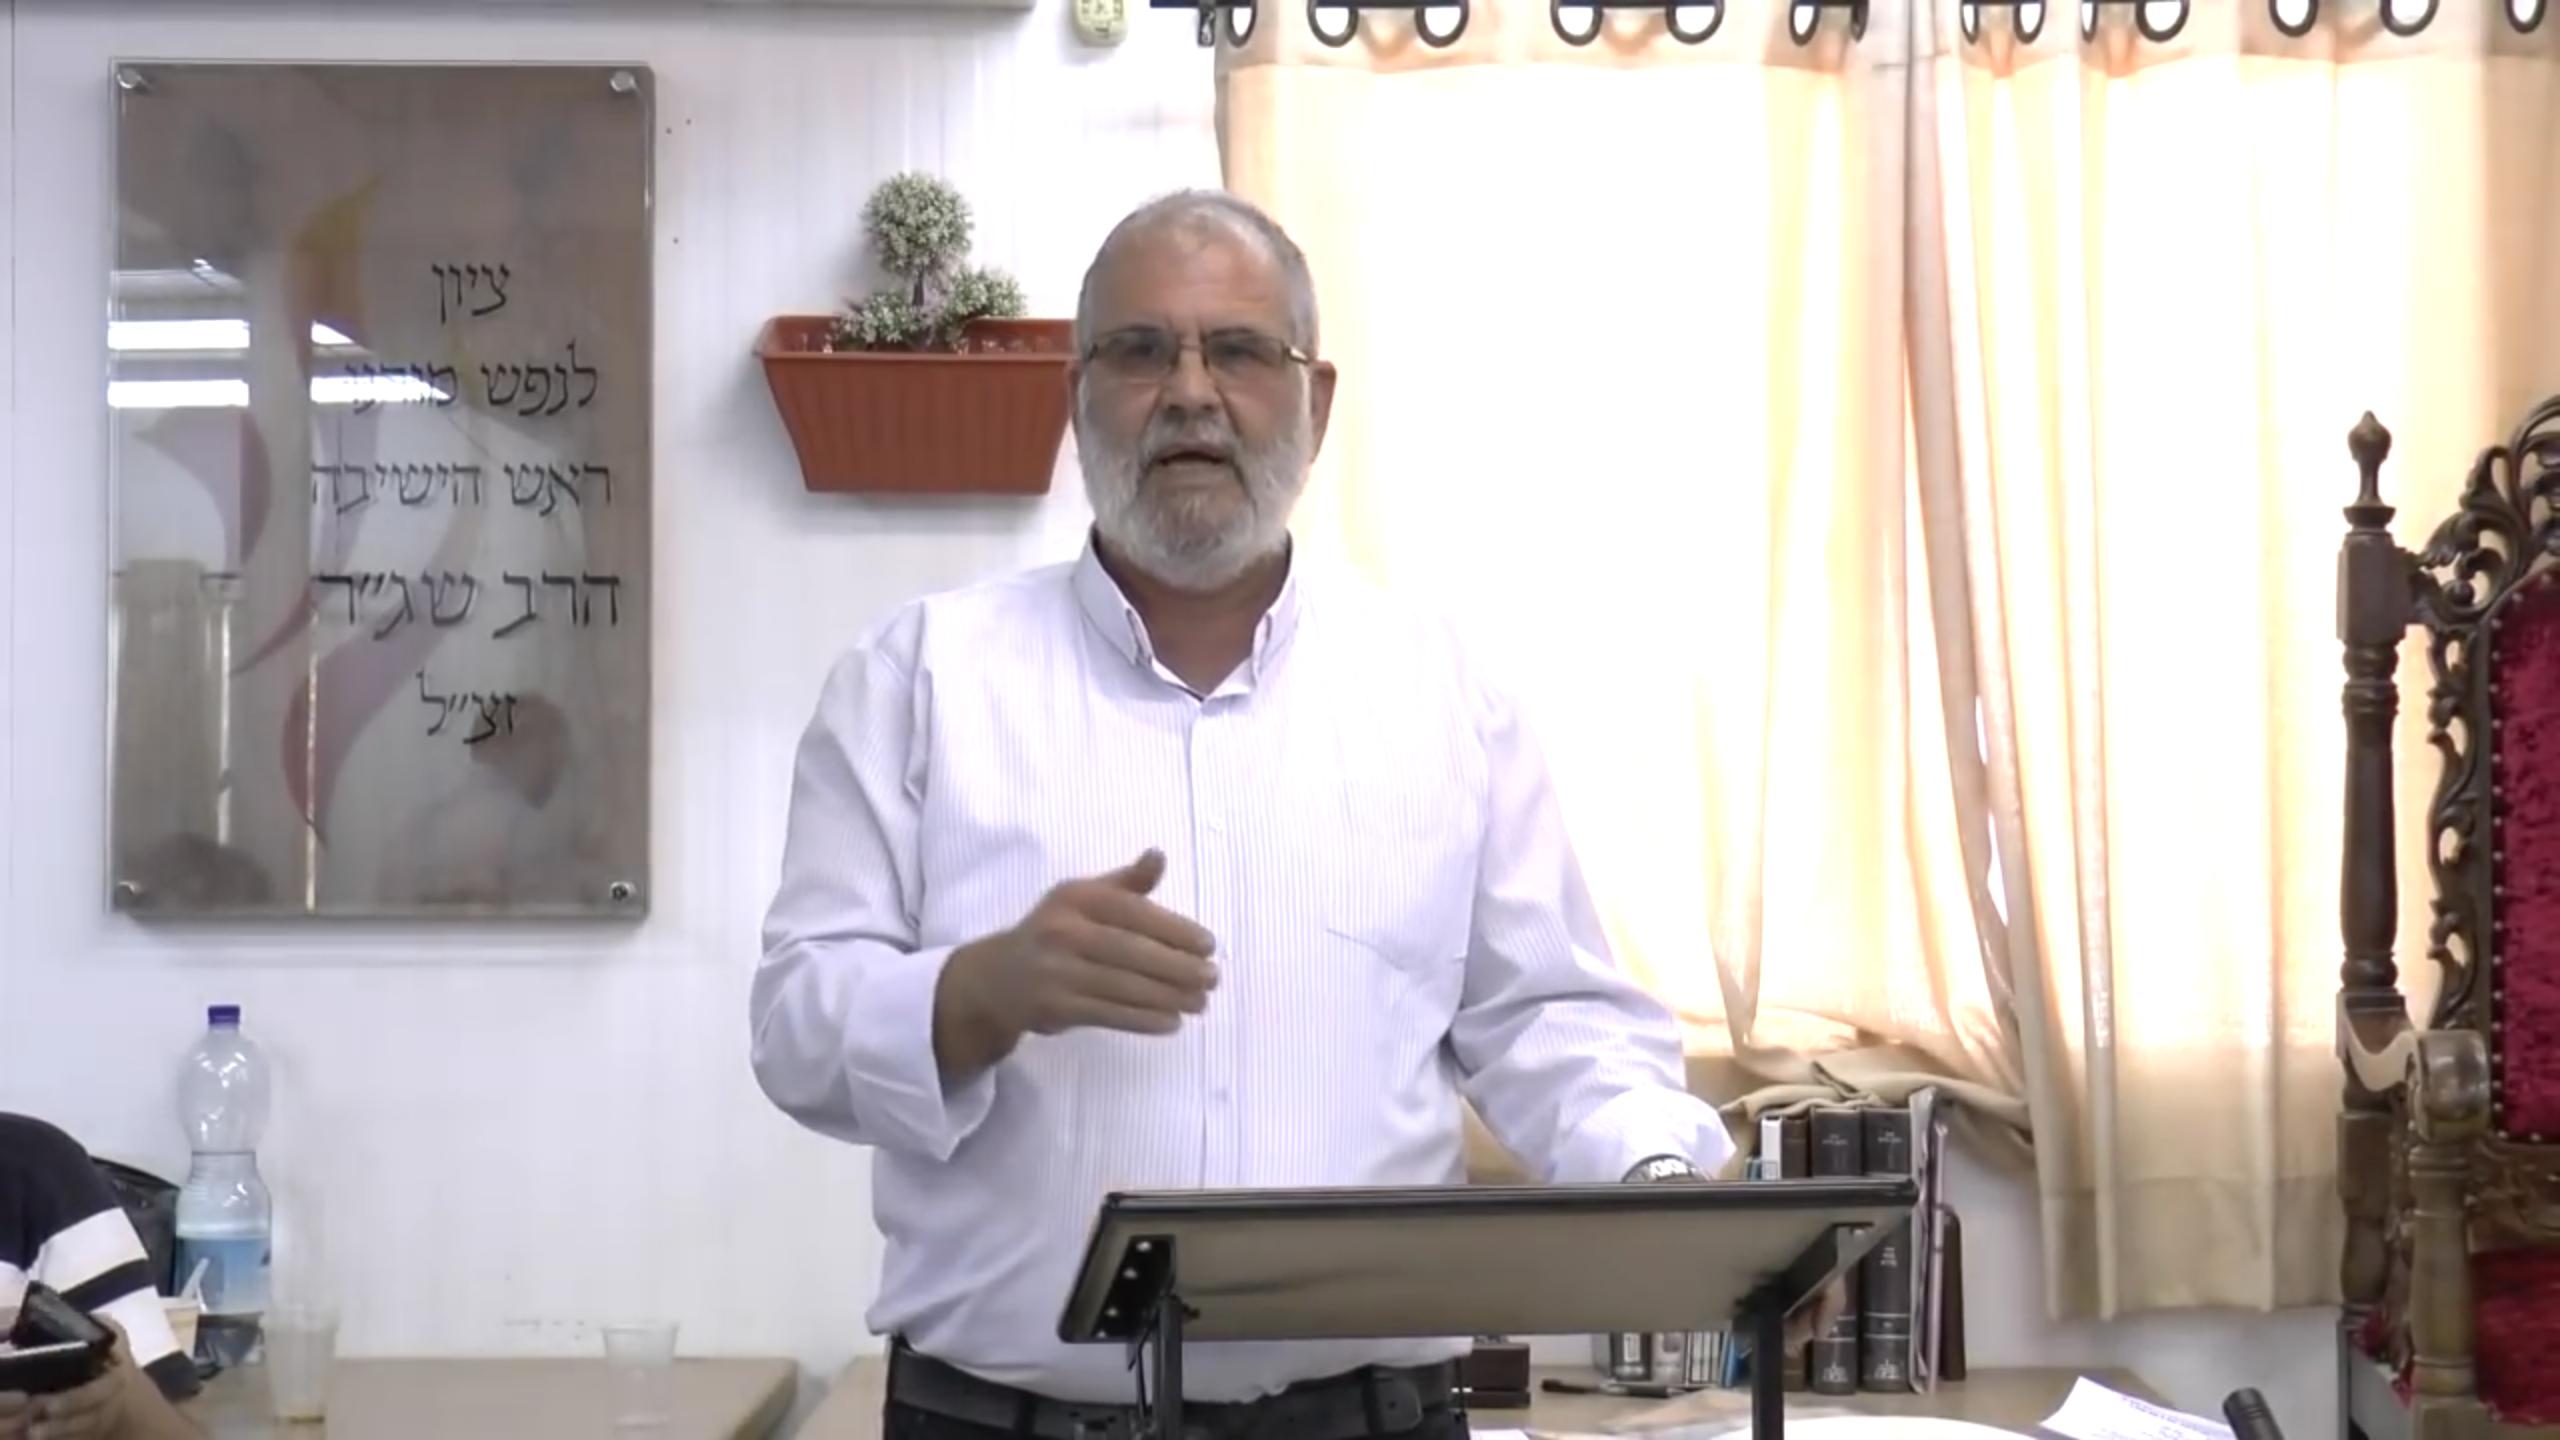 Rabbi David Bigman